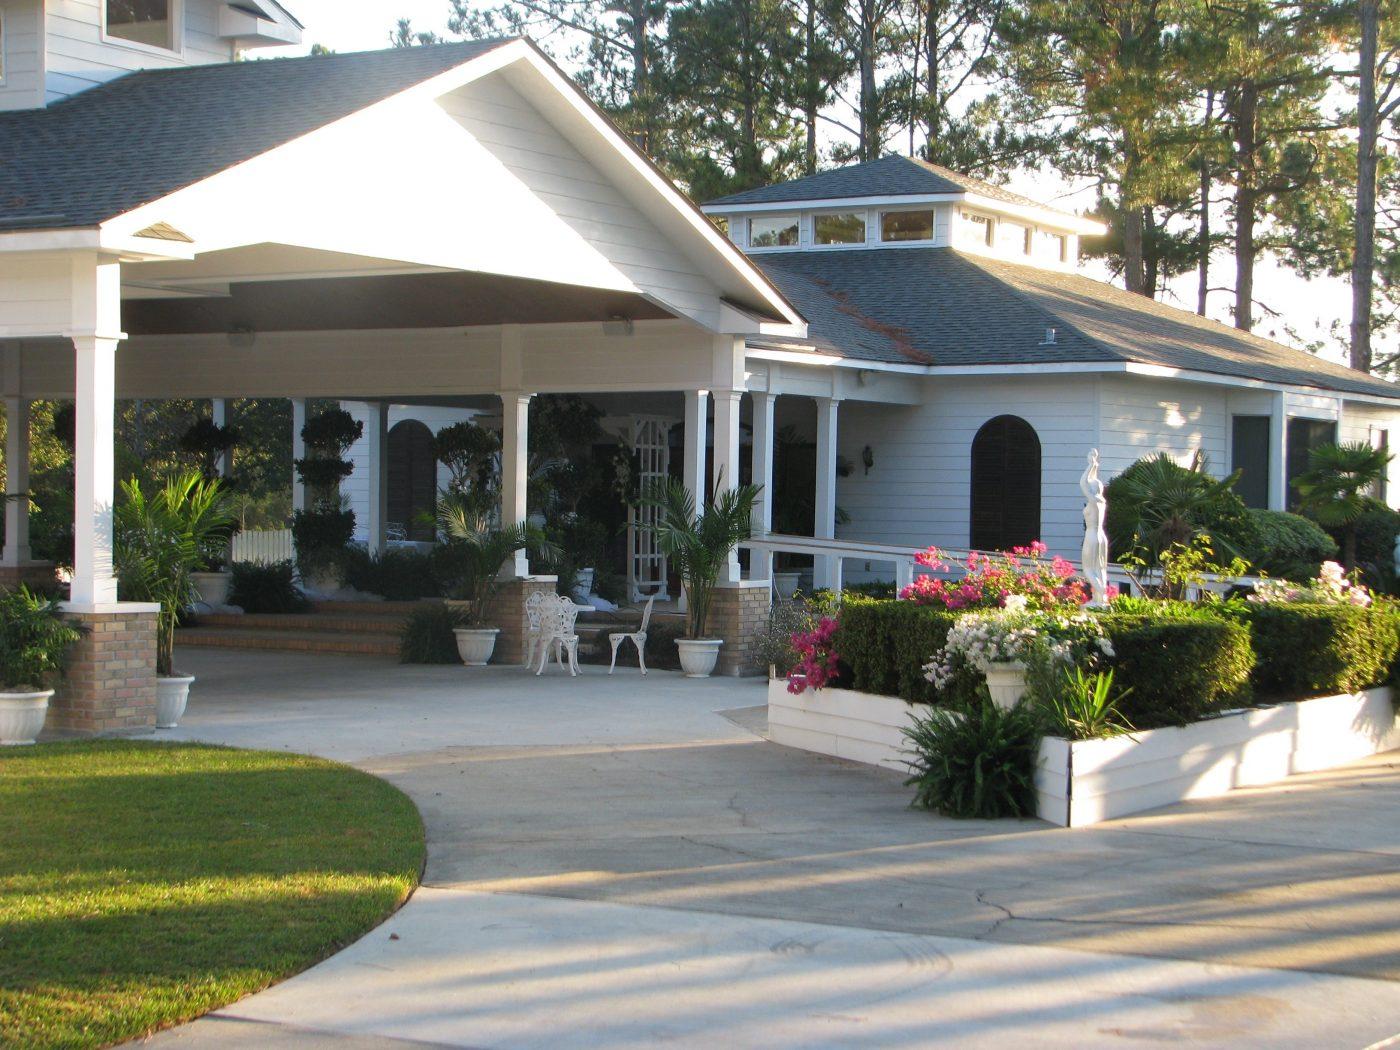 Gulf Shores Wedding Chapel - Pavilion